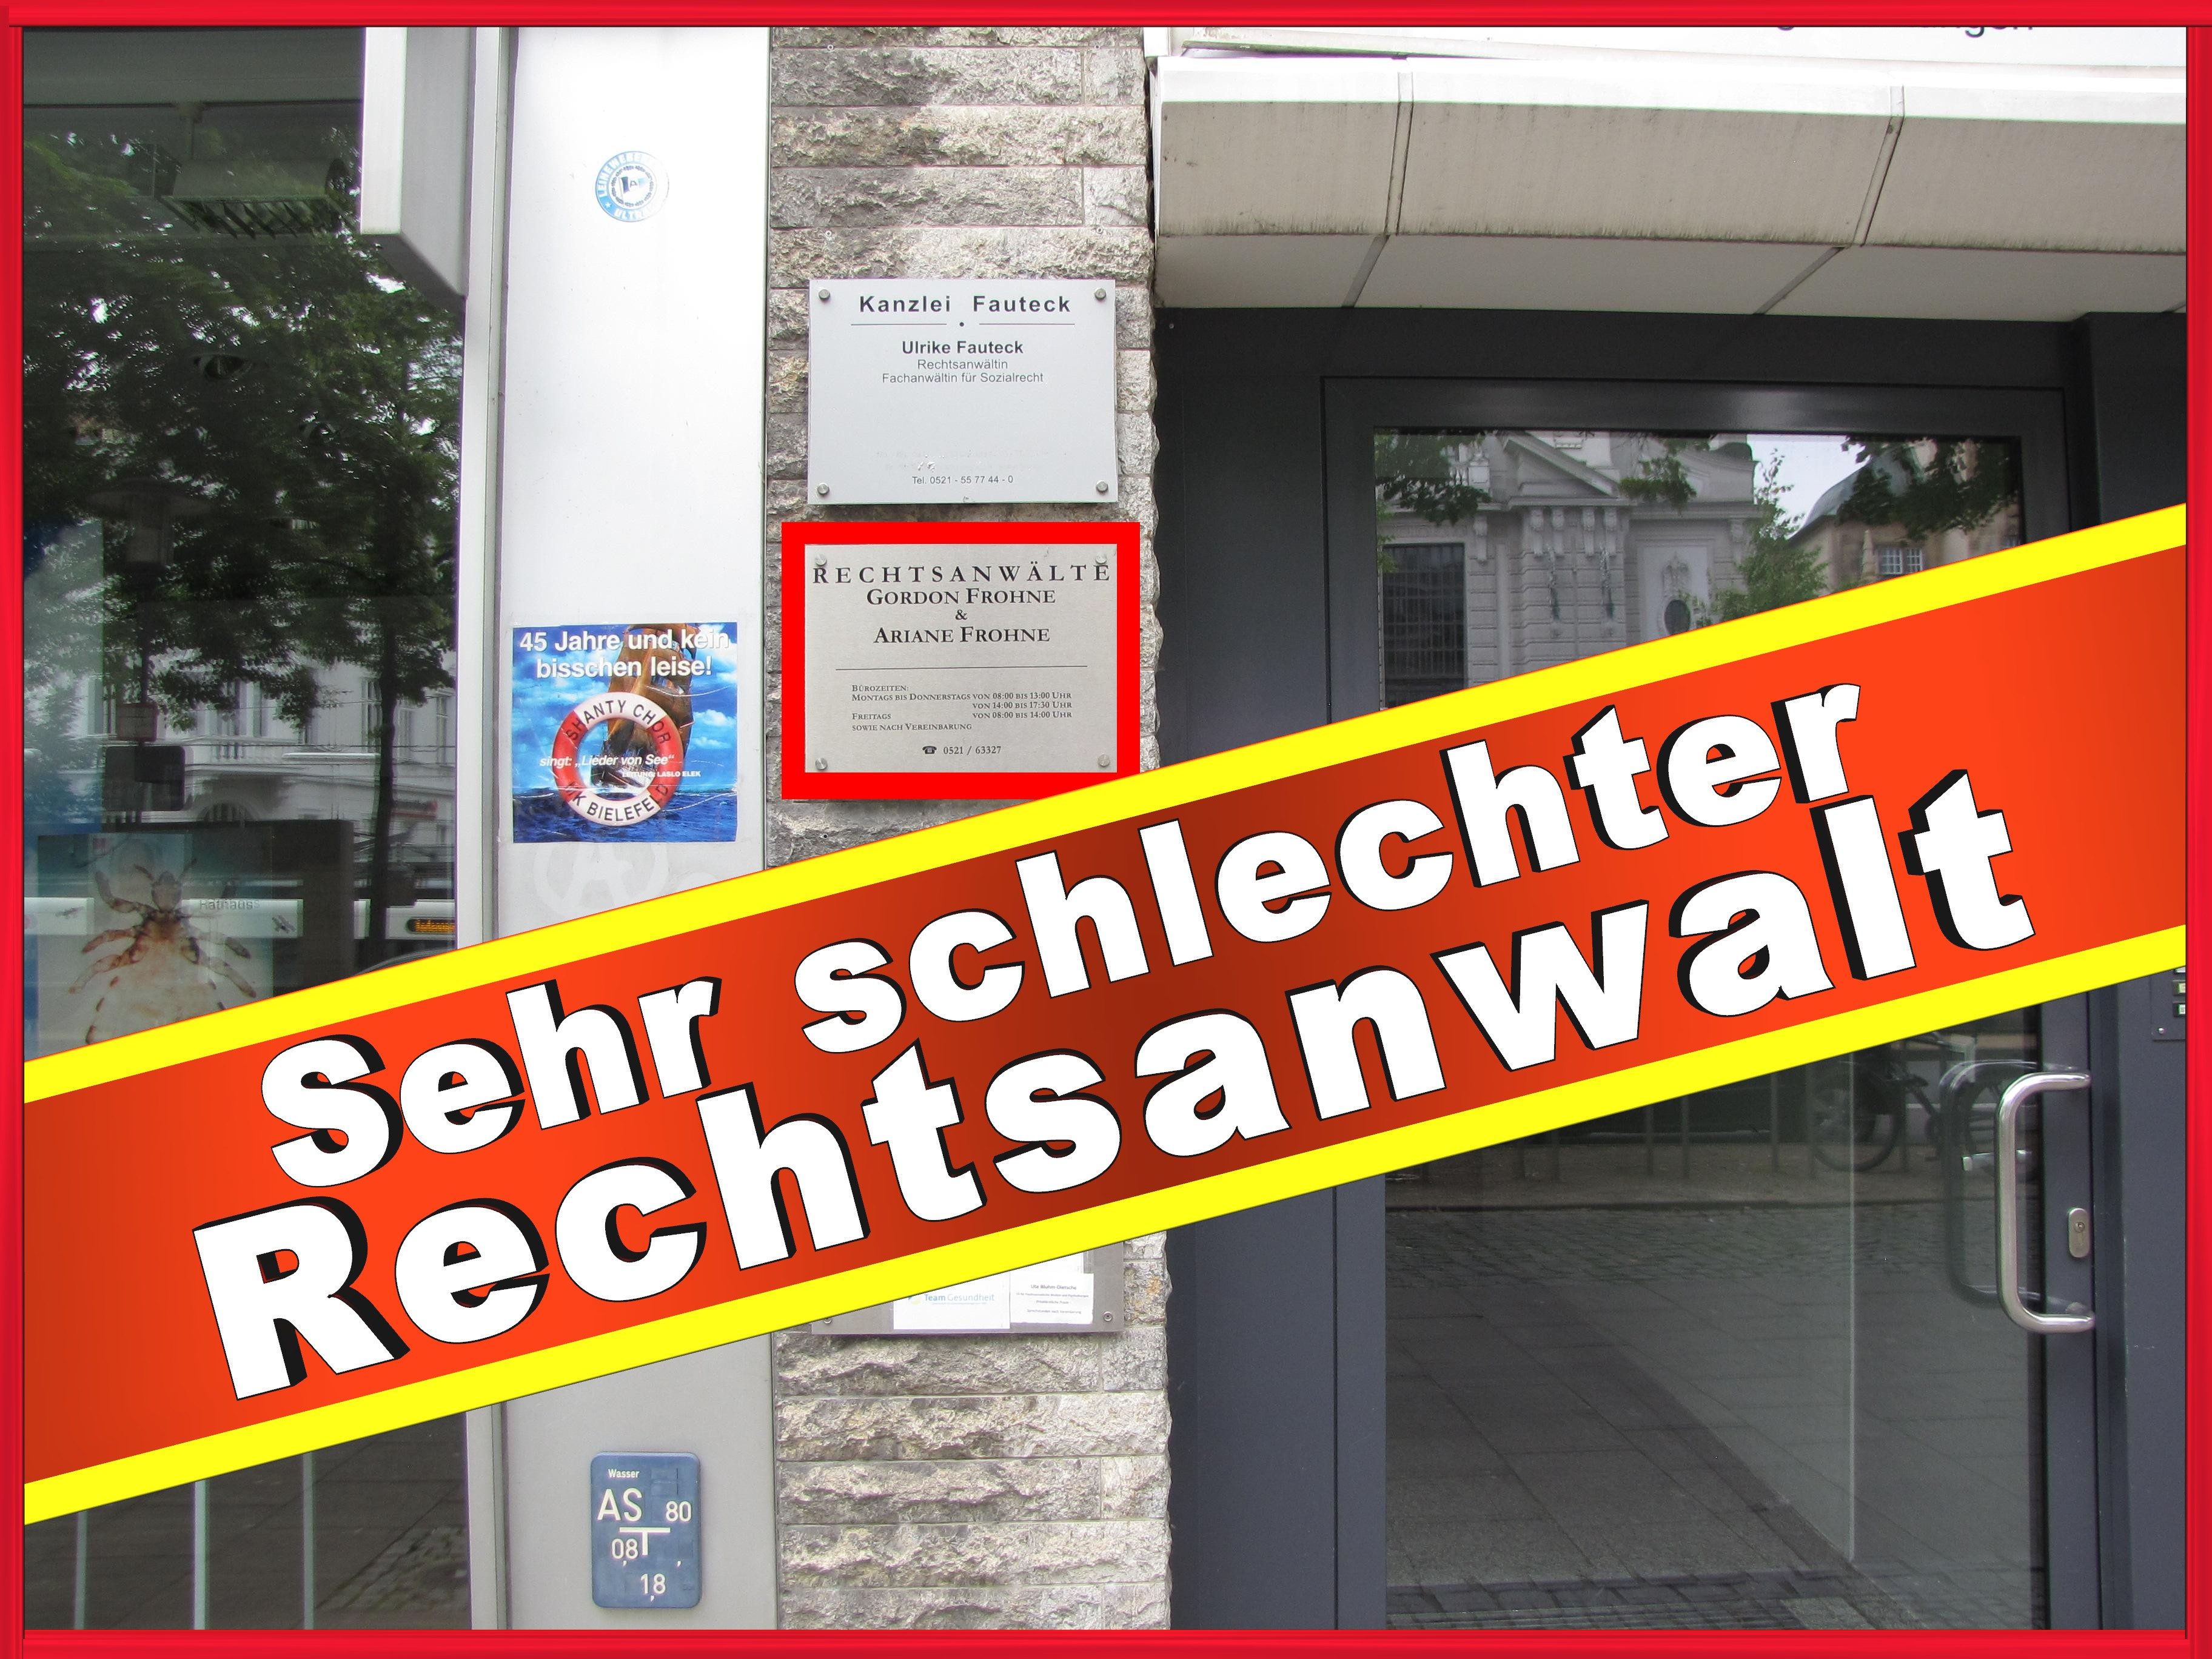 Rechtsanwalt Gordon Frohne Niederwall Bielefeld Ariane Frohne Gordon Frohne Ariane Frohne Dr. jur. Michael Schmitz